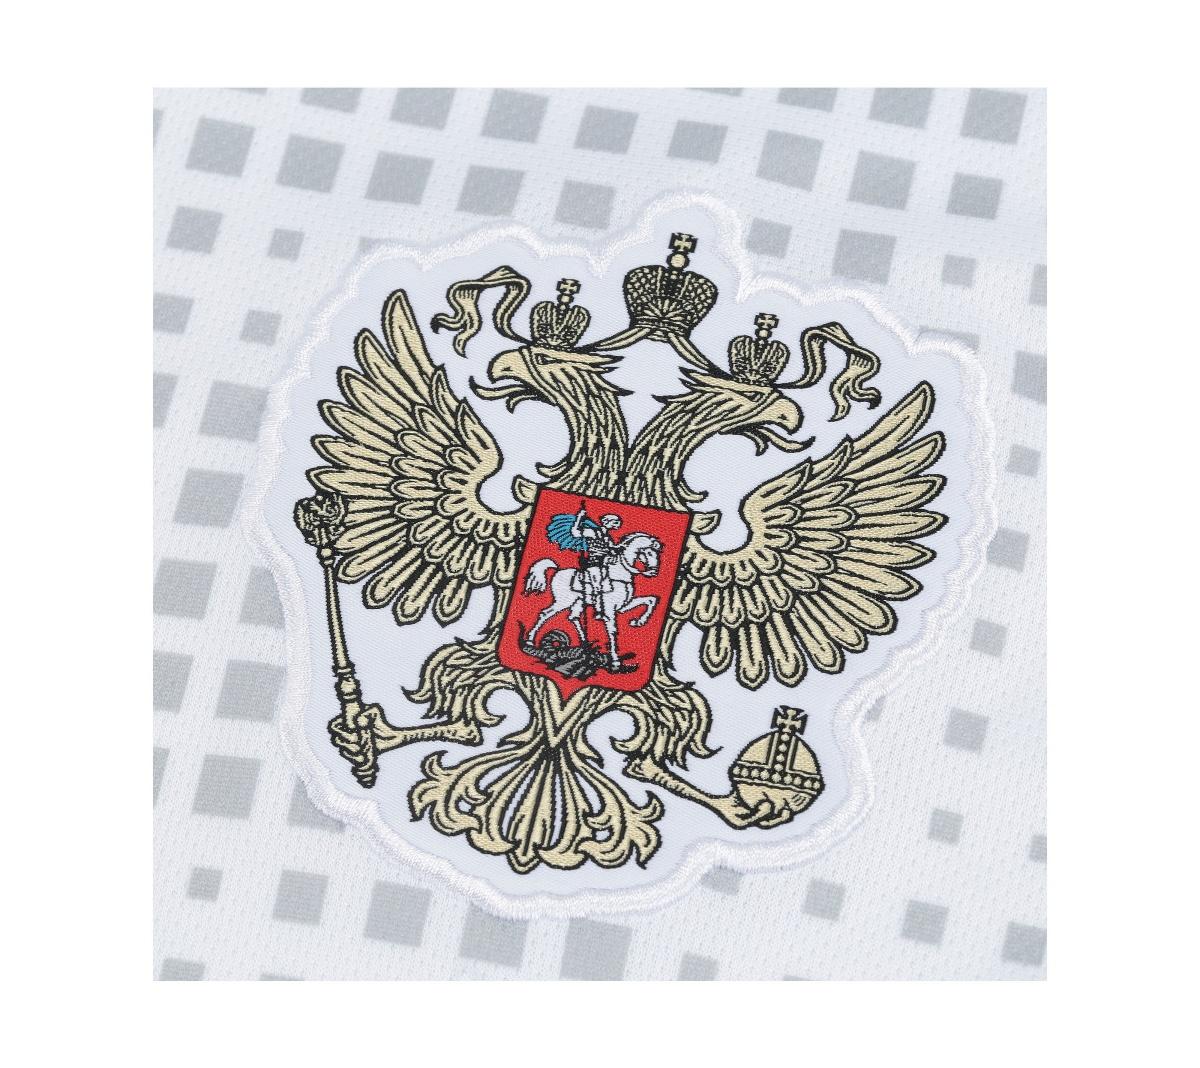 Camisa Adidas Rússia II 2018 Torcedor Adulto Oficial